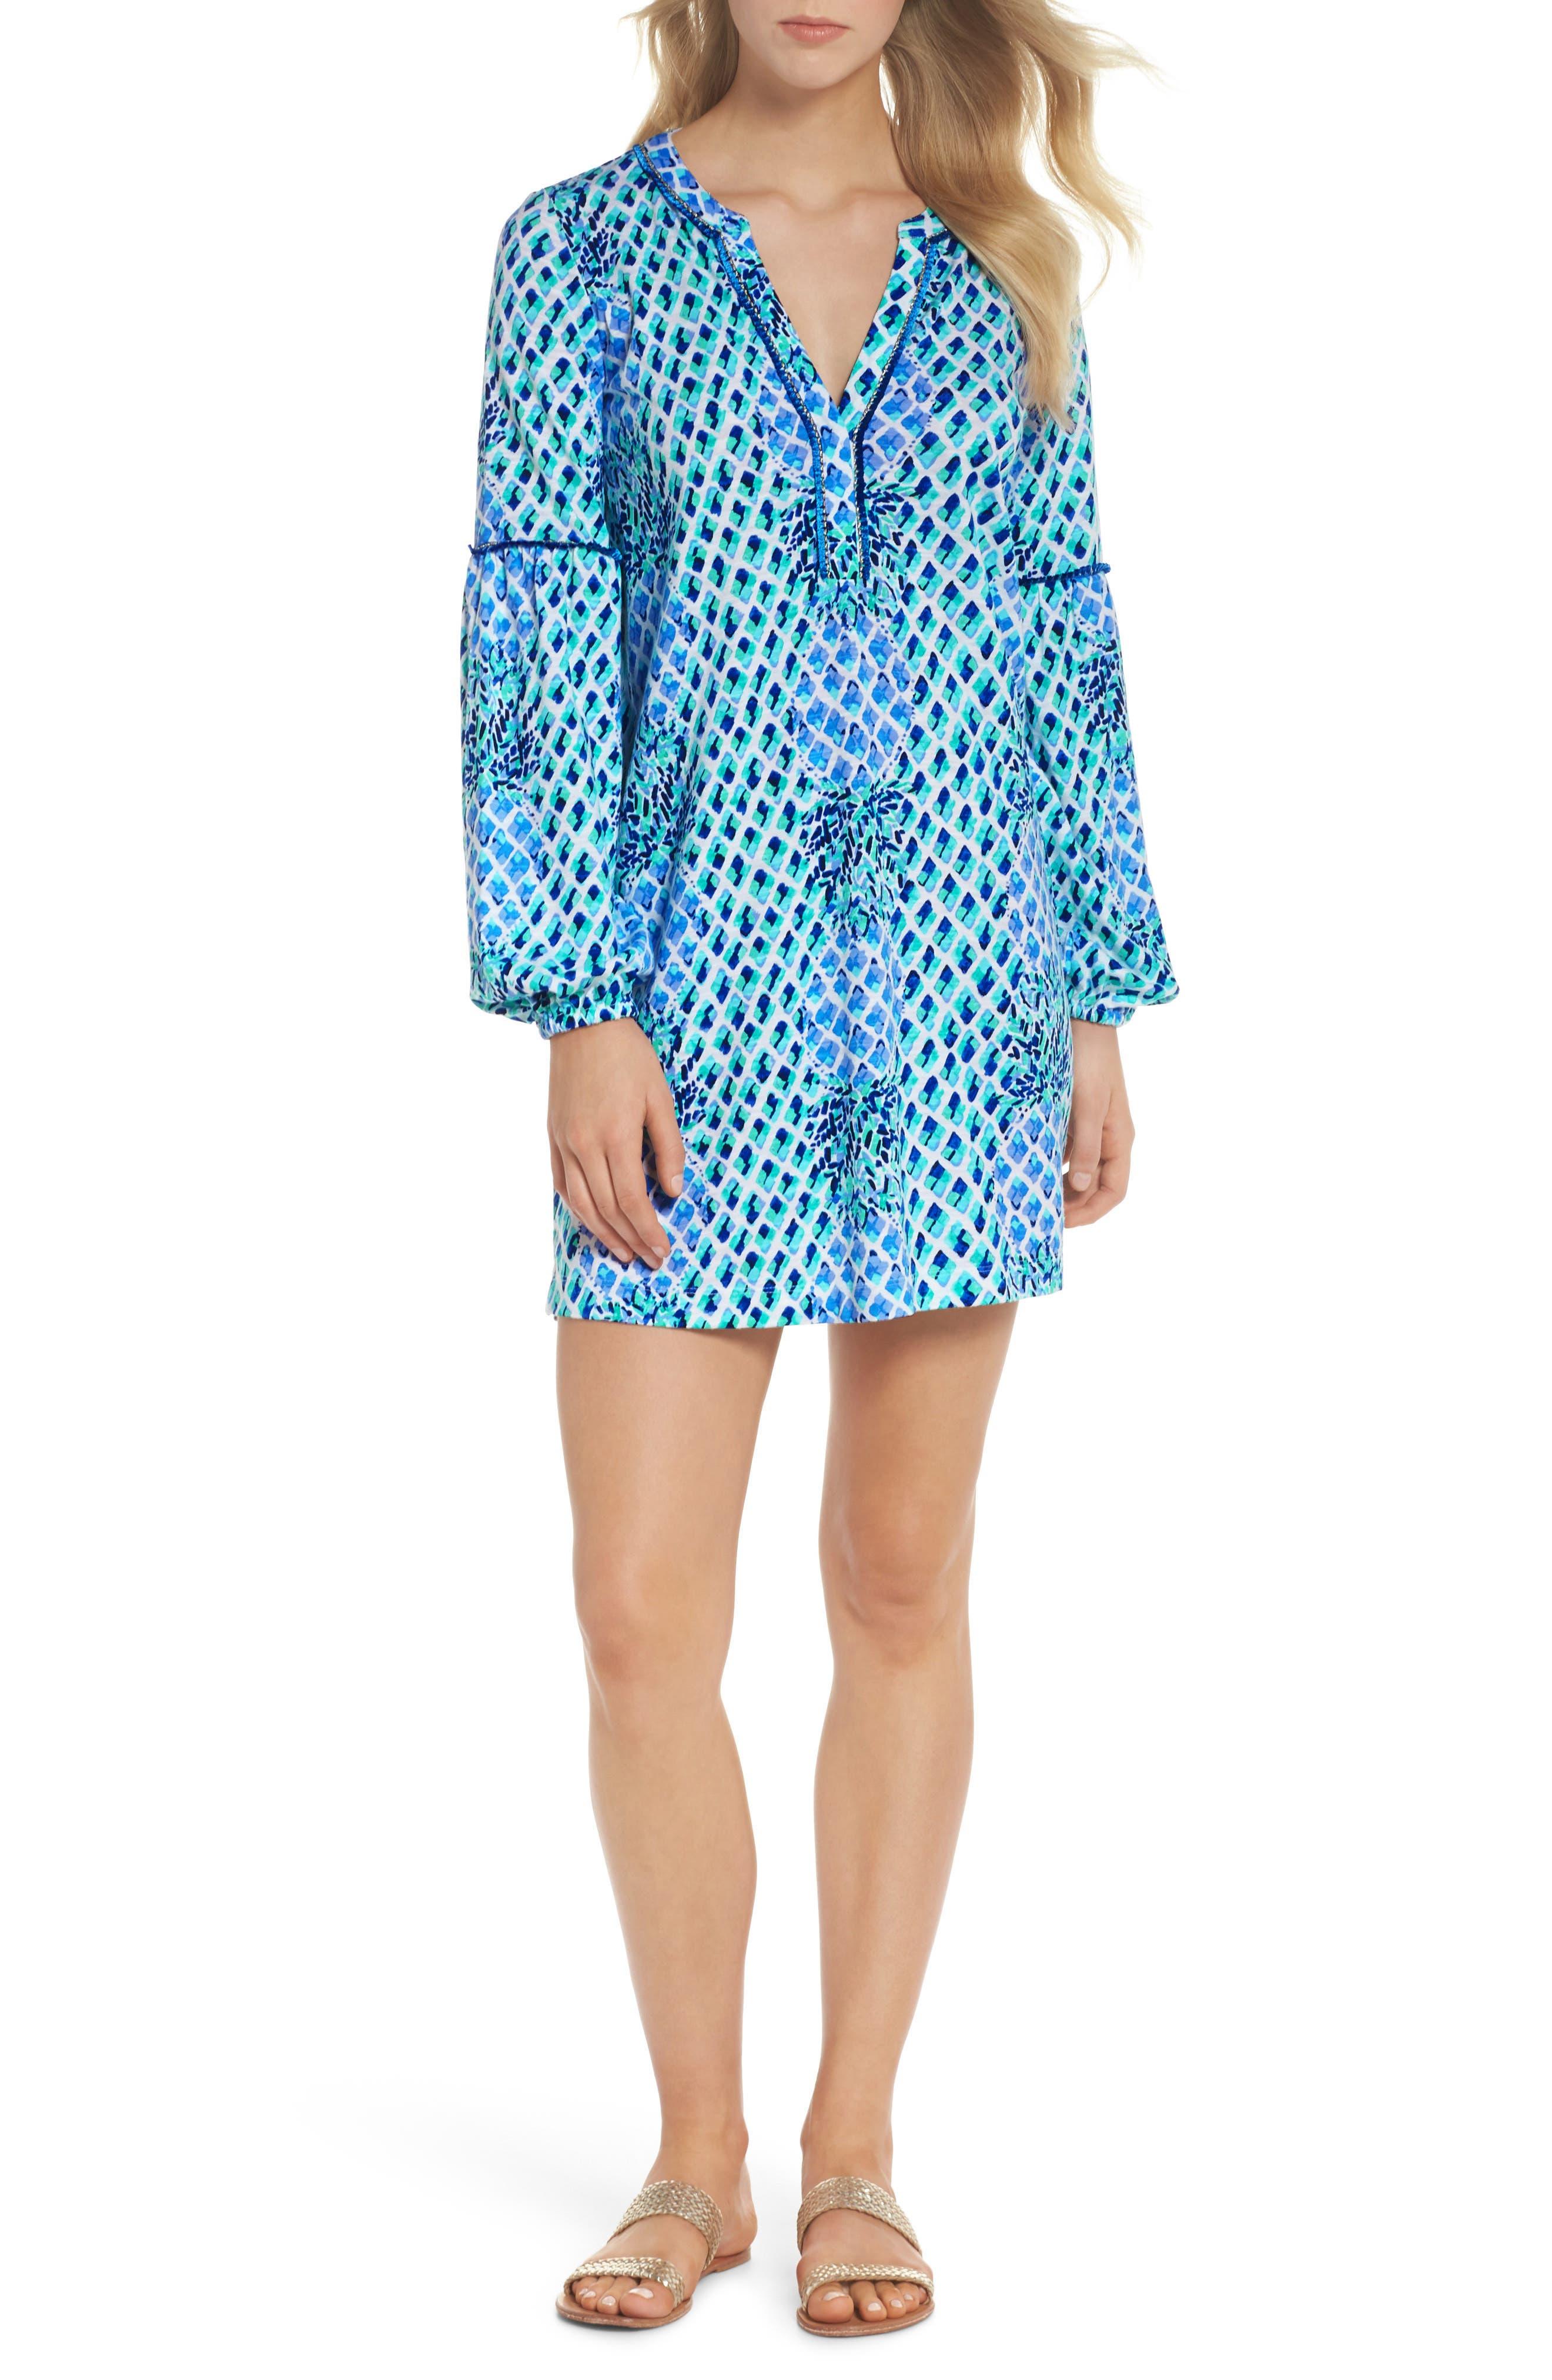 Joy Tunic Dress,                             Main thumbnail 1, color,                             400